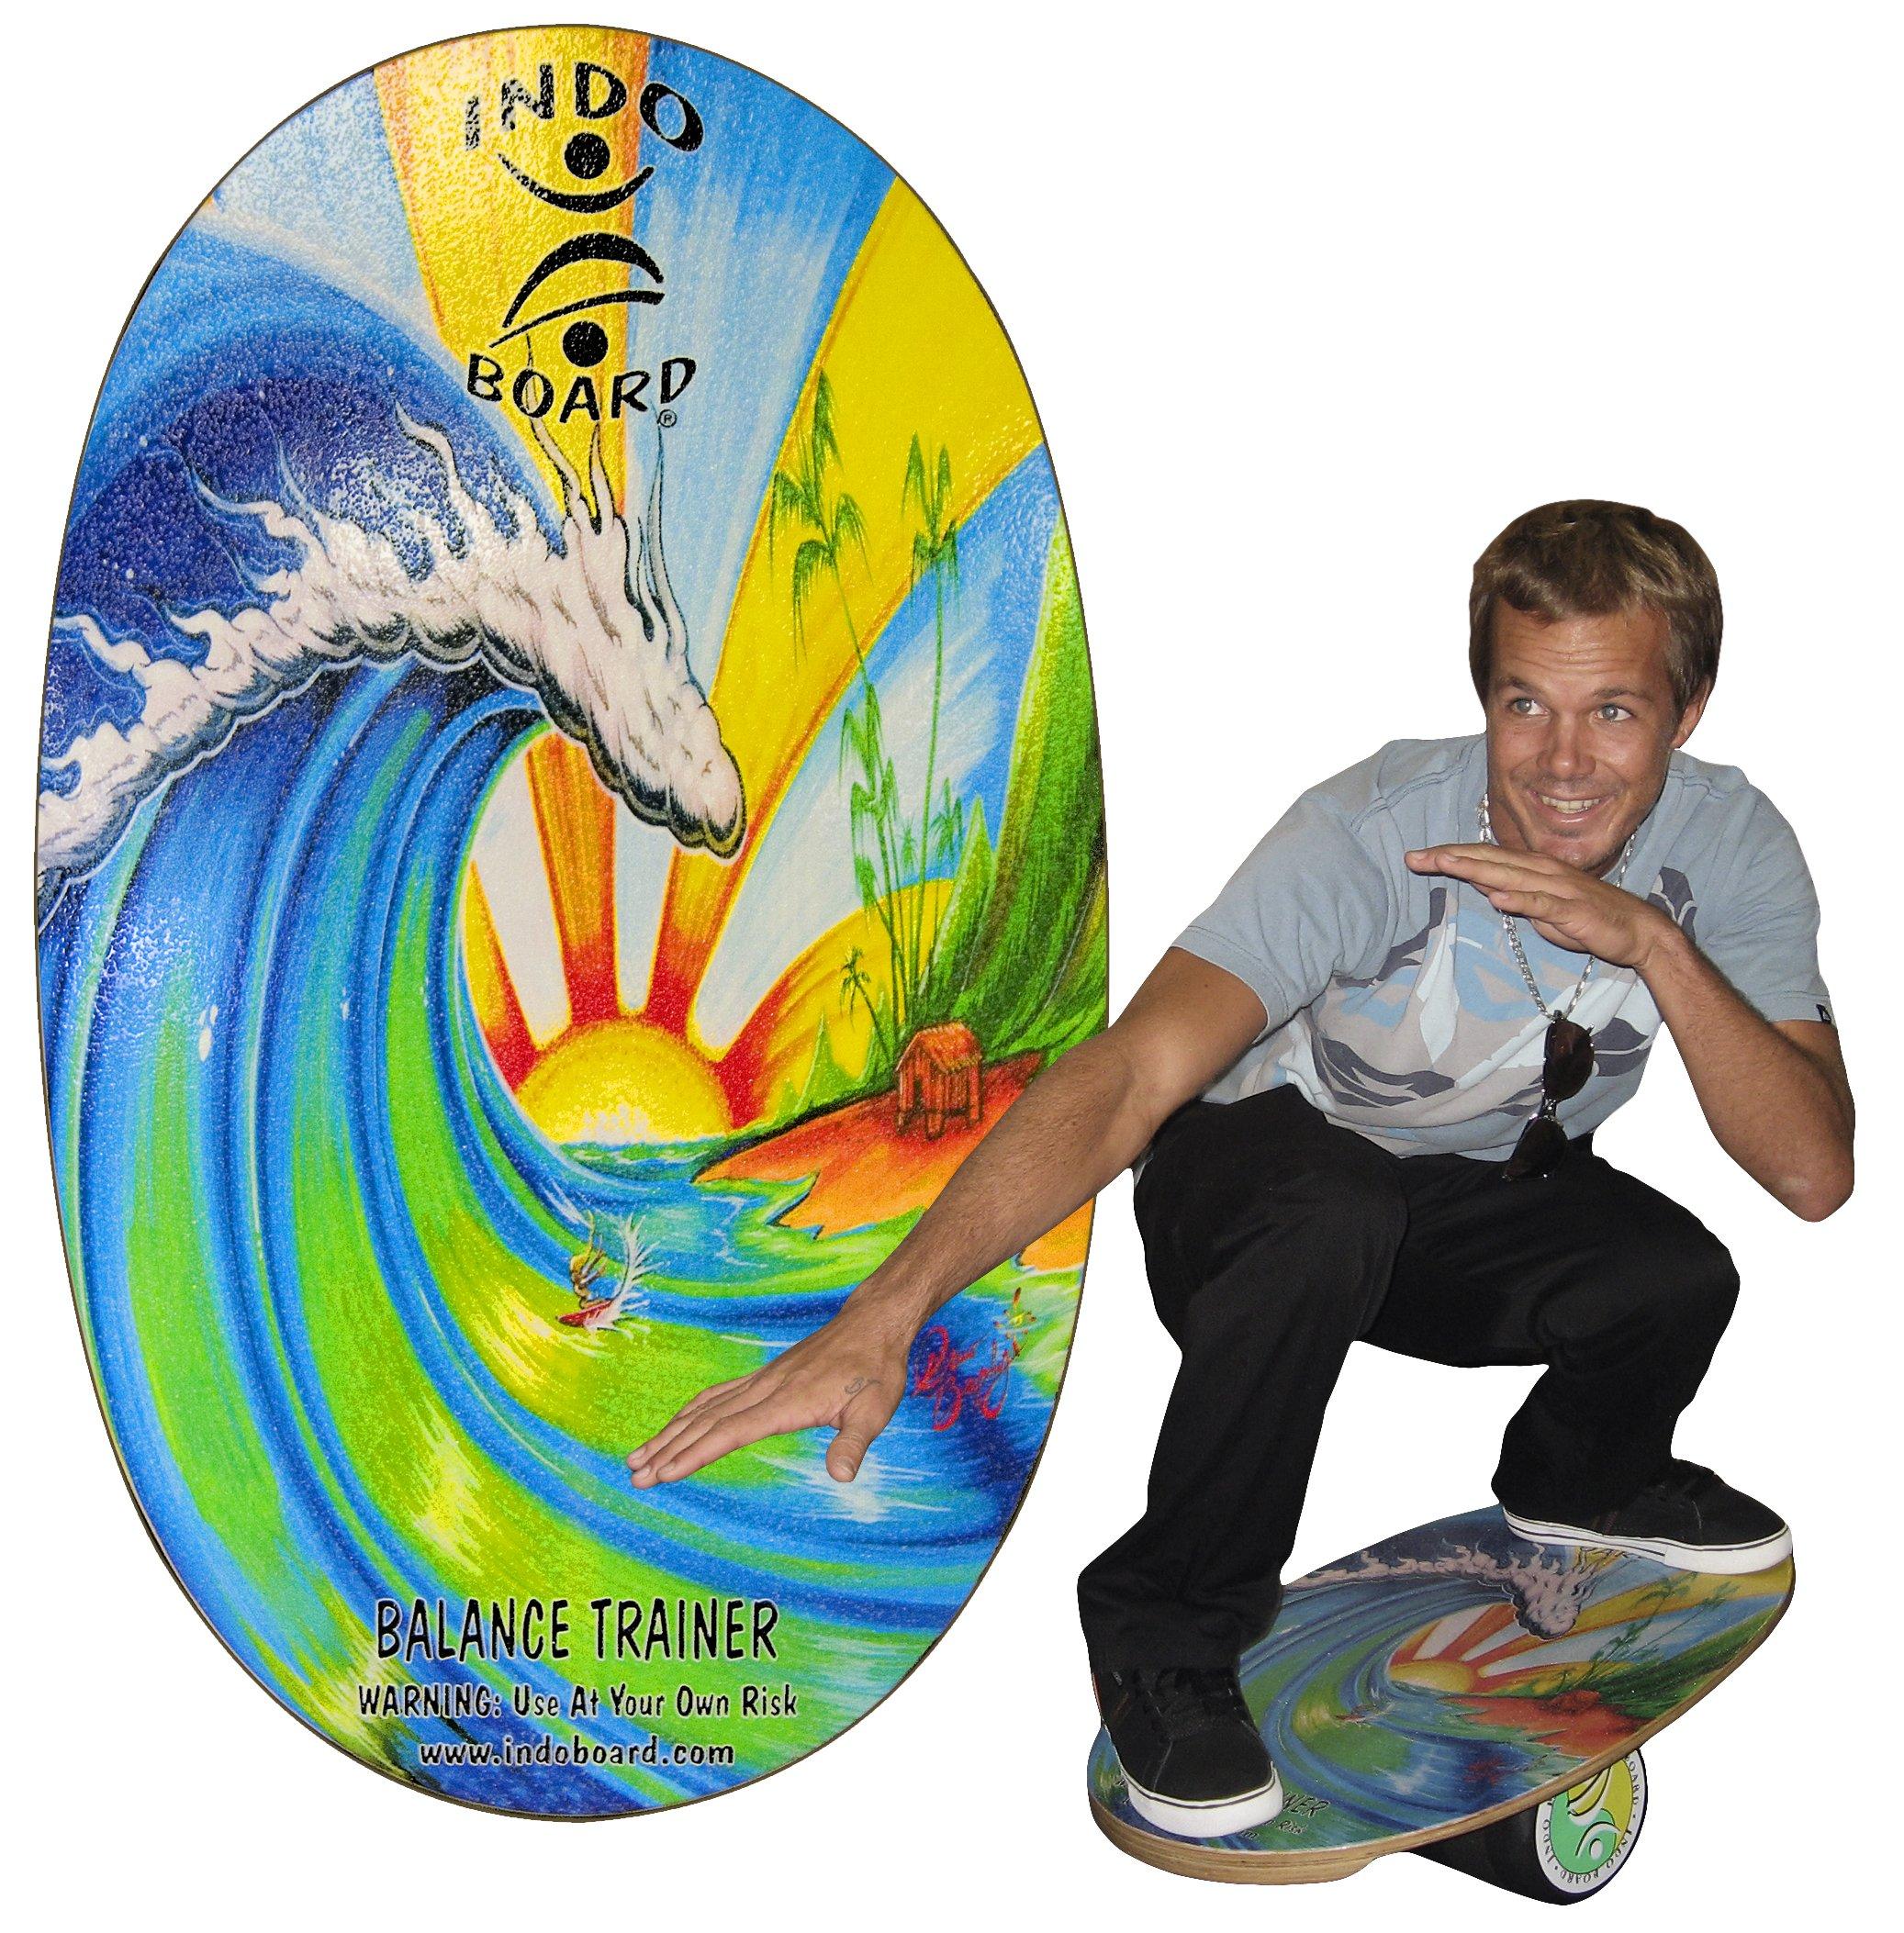 "INDO BOARD Original Balance Board with 6.5"" Roller and 30"" X 18"" Non-Slip Deck – Bamboo Beach Design by INDO BOARD (Image #6)"